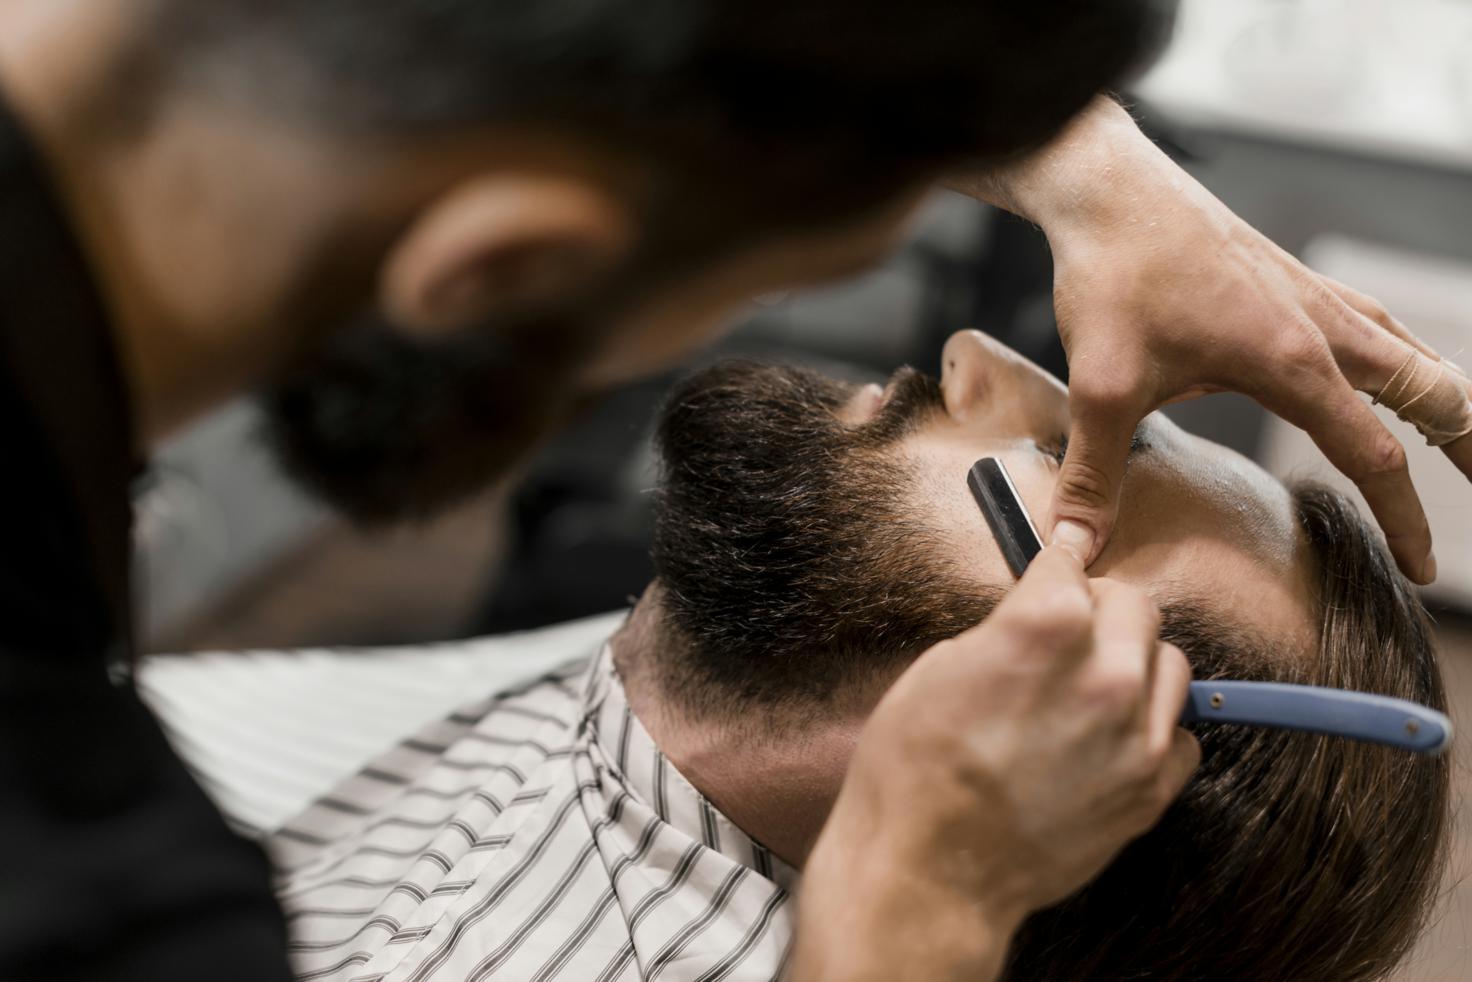 olio argan barba - Natyoure - www.natyoure.it